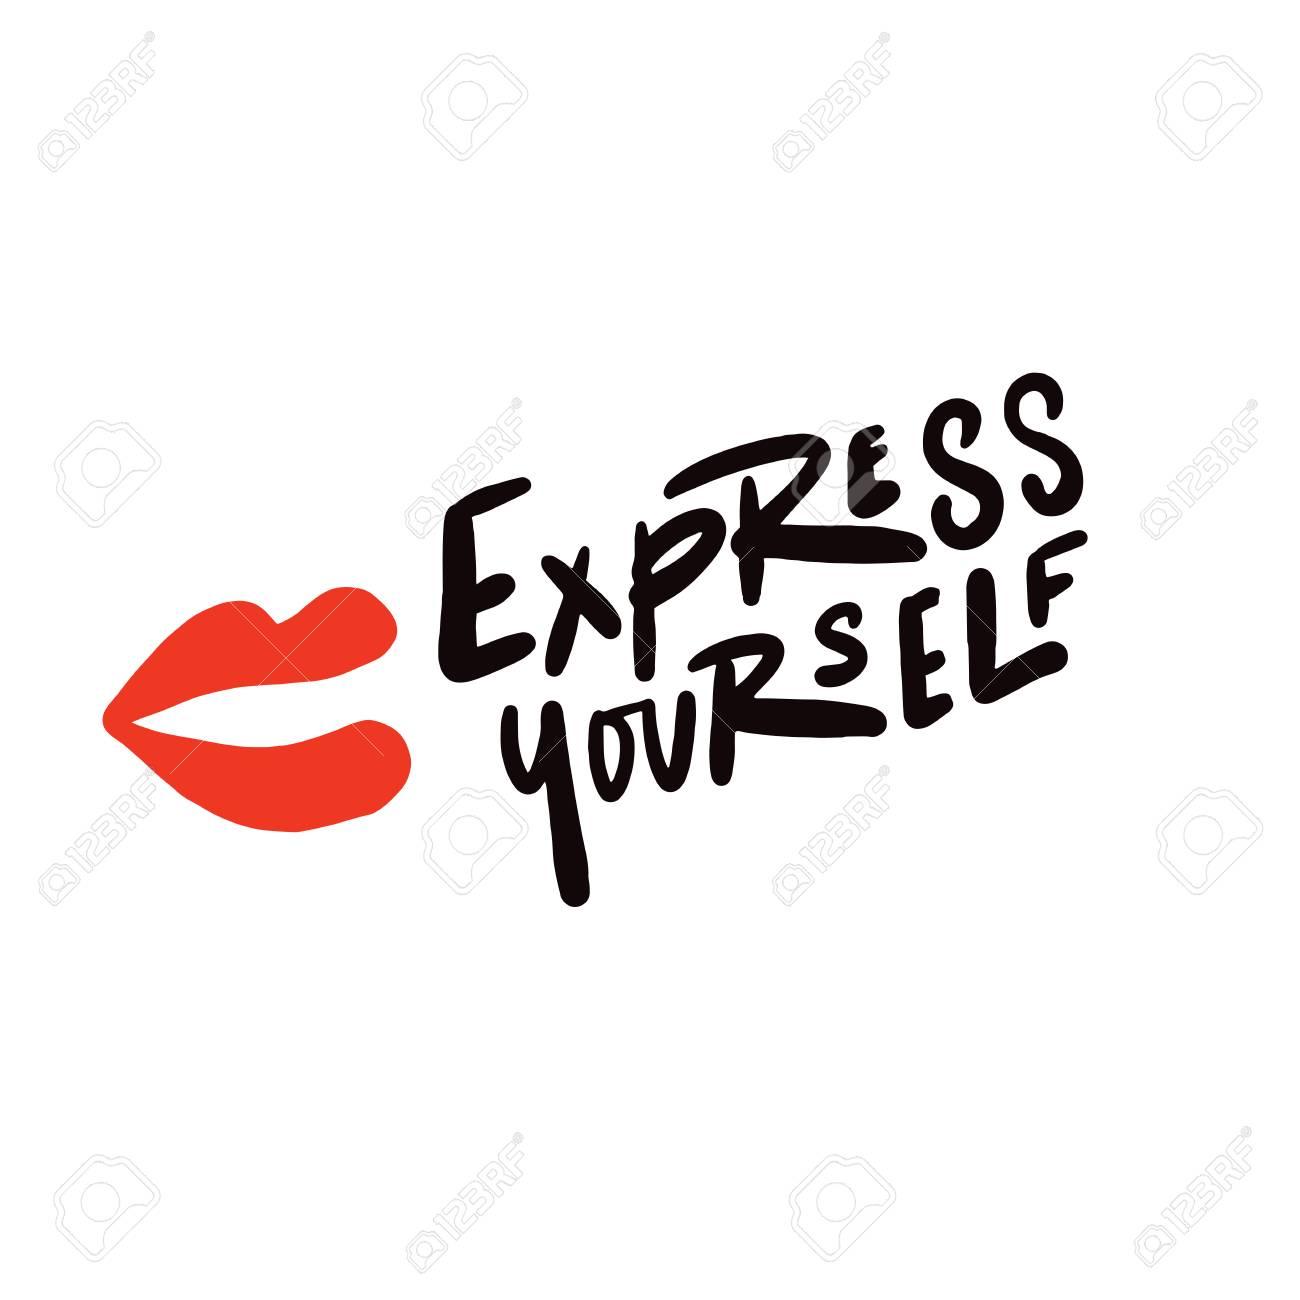 Express yourself. Hand written lettering. Vector design. - 116616732